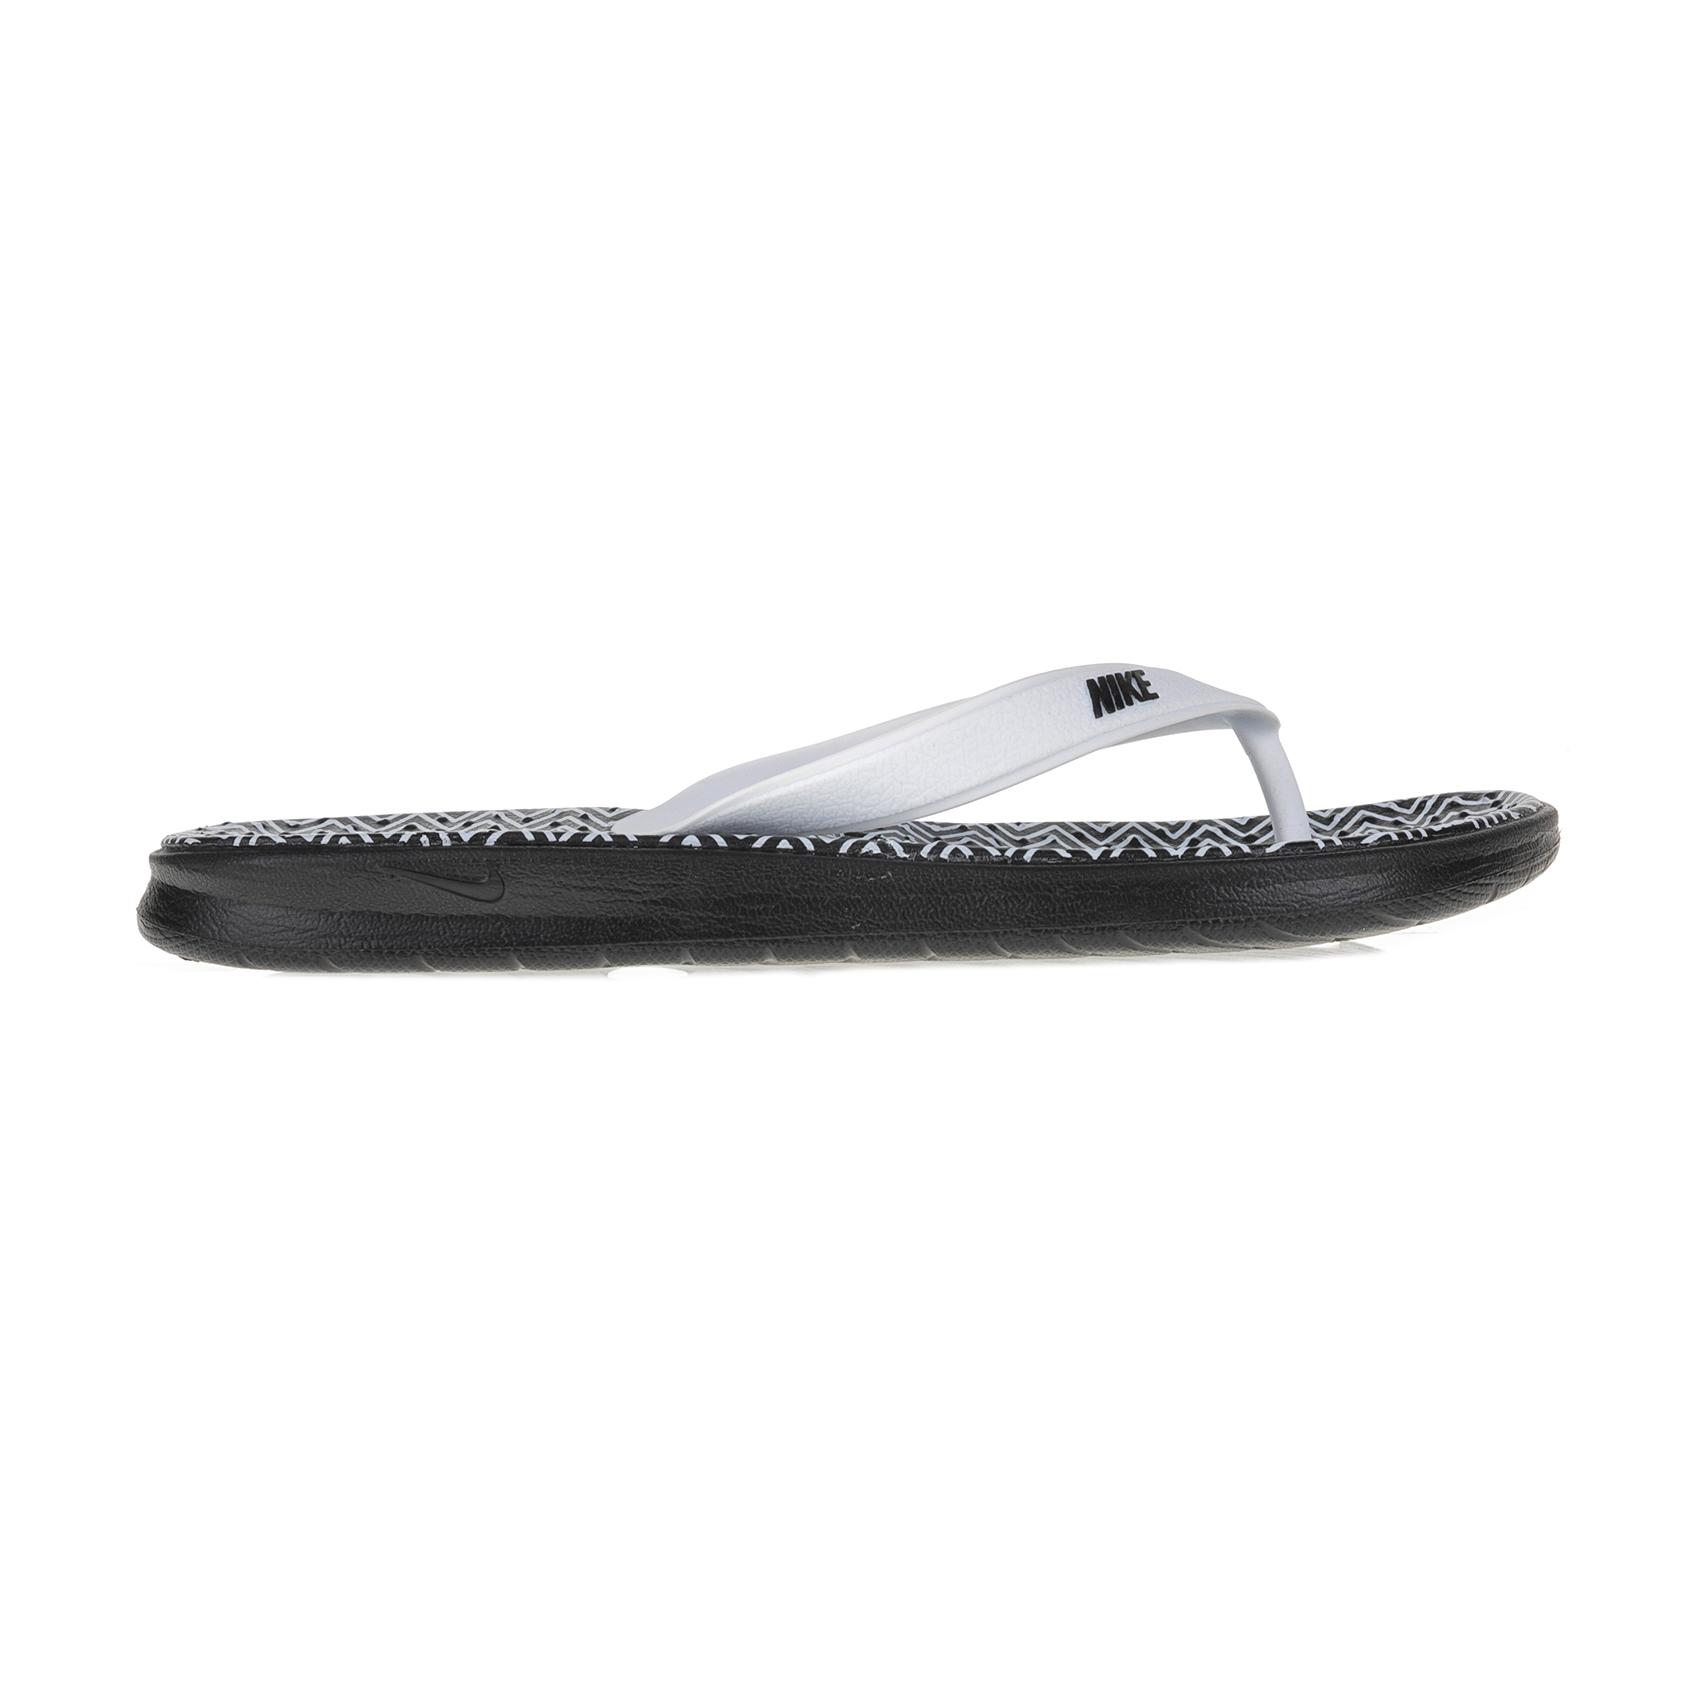 NIKE – Γυναικείες σαγιονάρες NIKE SOLAY THONG μαύρο-λευκό μοτίβο